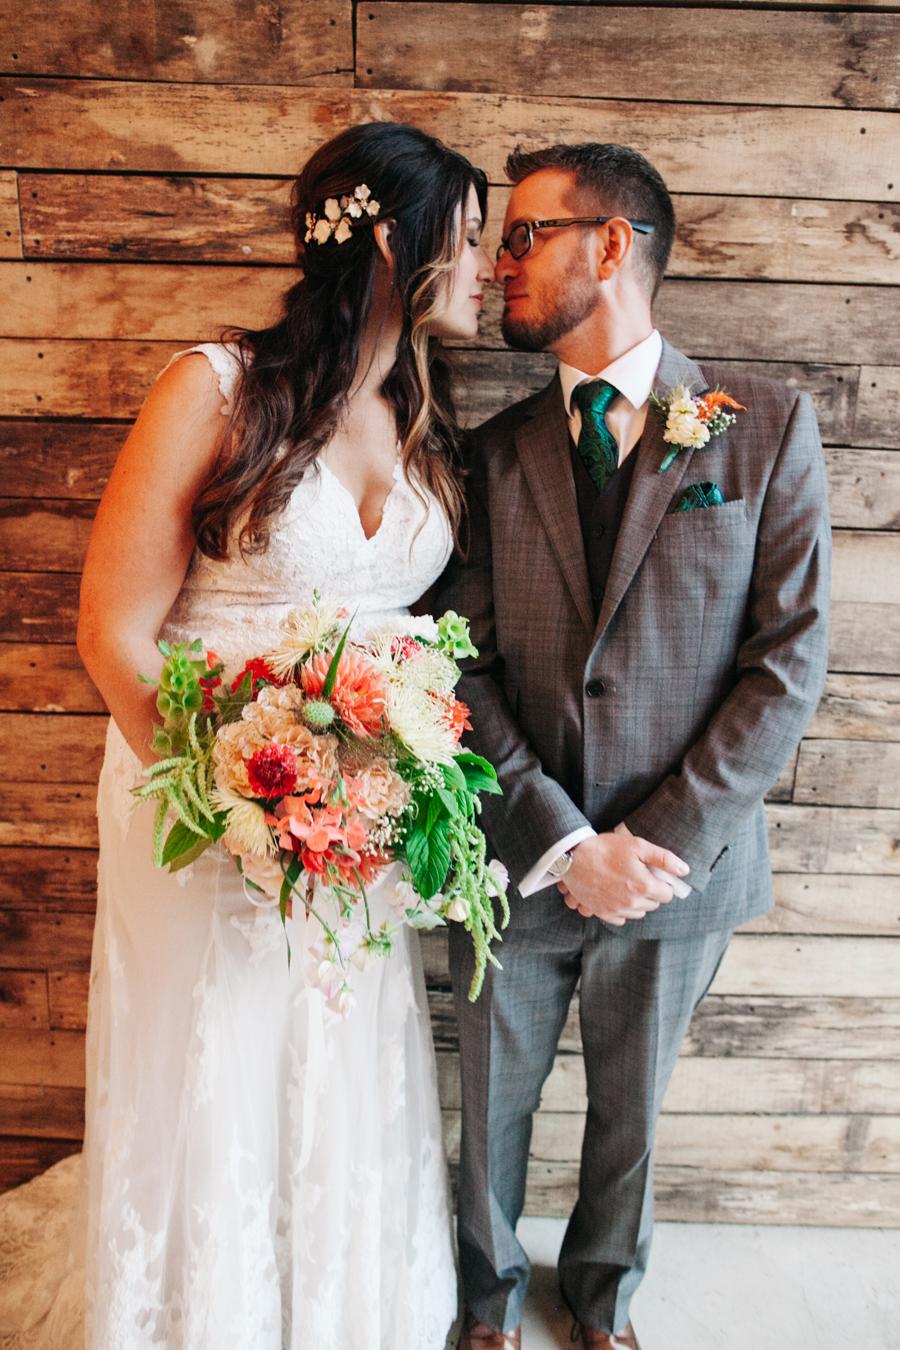 020-bellingham-wedding-photographer-katheryn-moran-photography-farm-kitchen.jpg